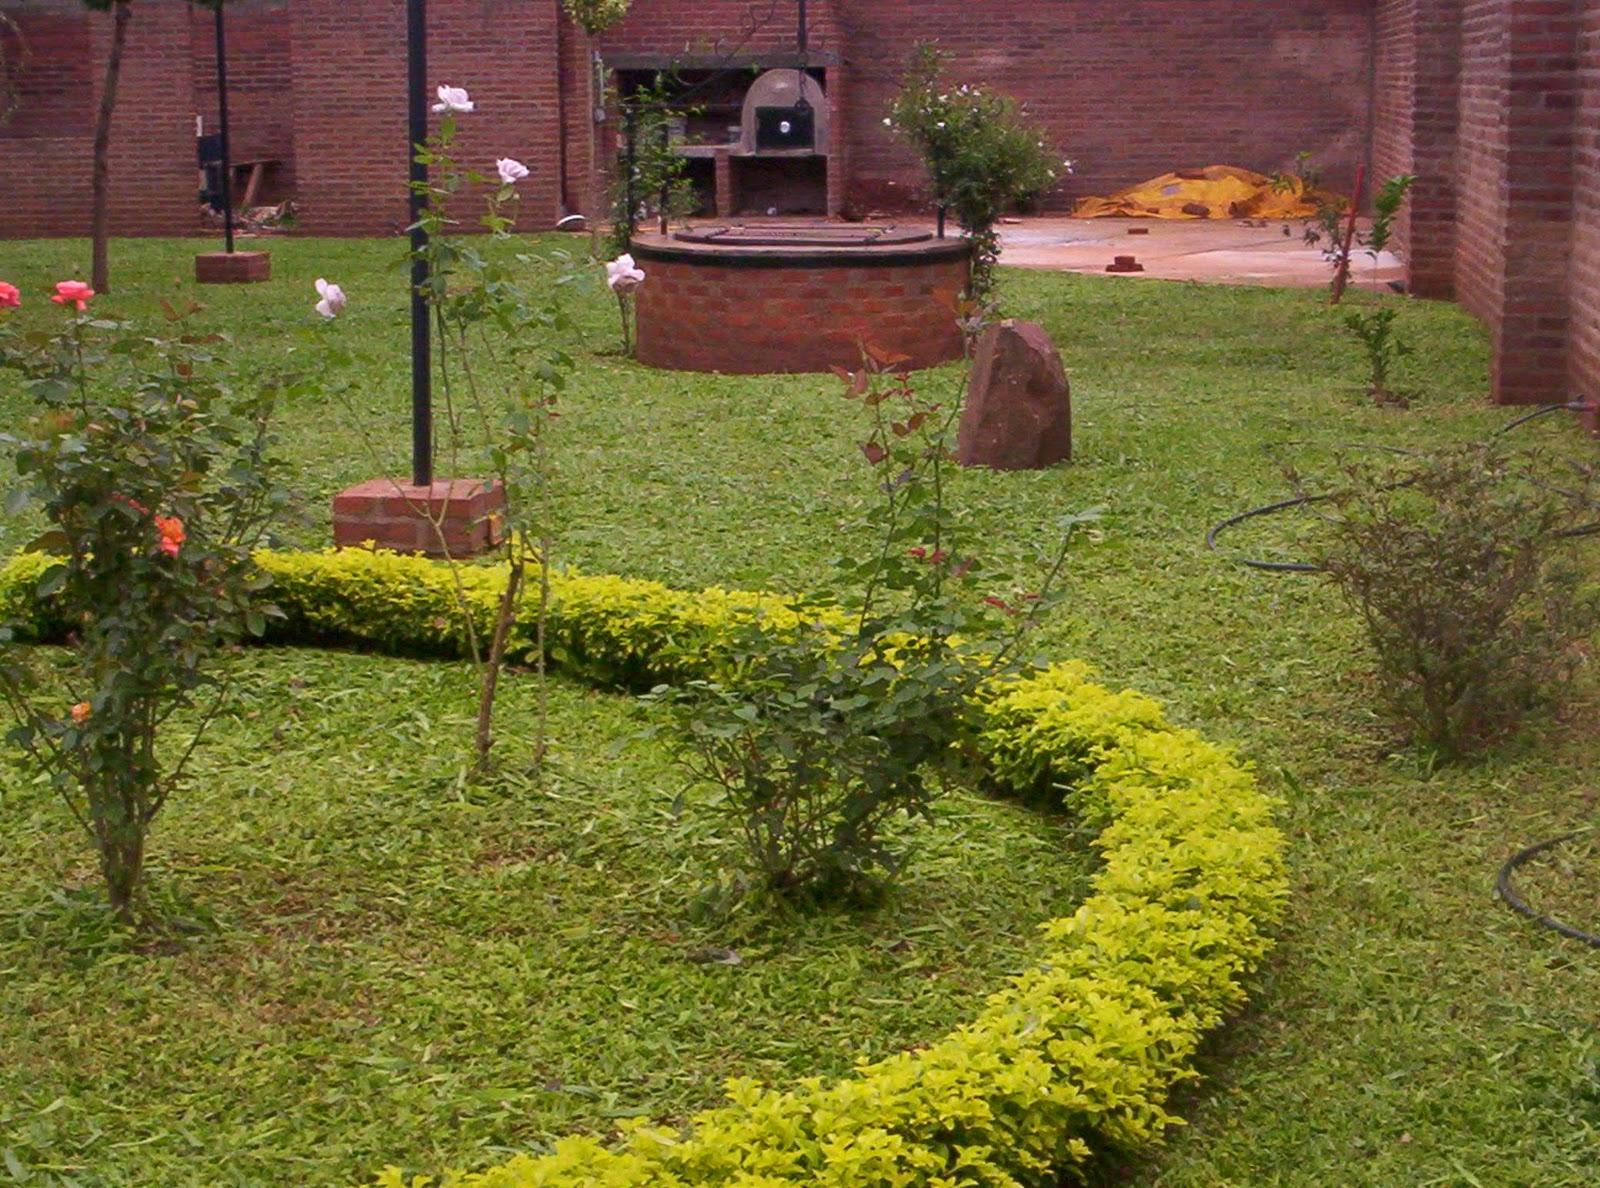 Paisajes y jardines duranta - Jardines y paisajes ...